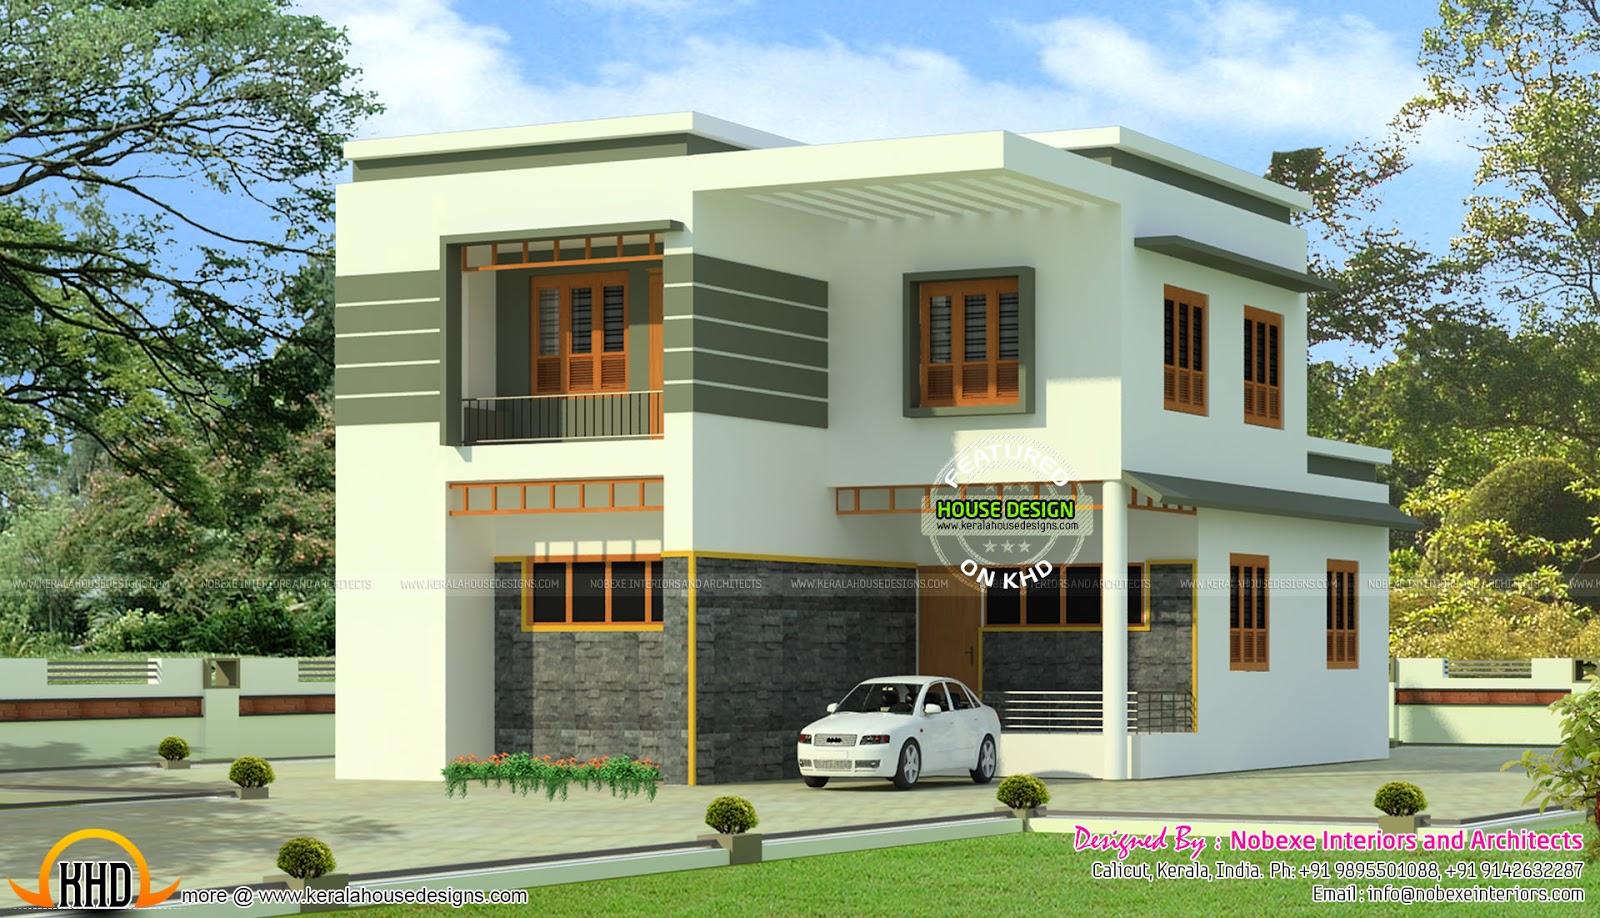 4 BHK Modern Flat Roof Home In 2160 Sq Ft Kerala Home Design